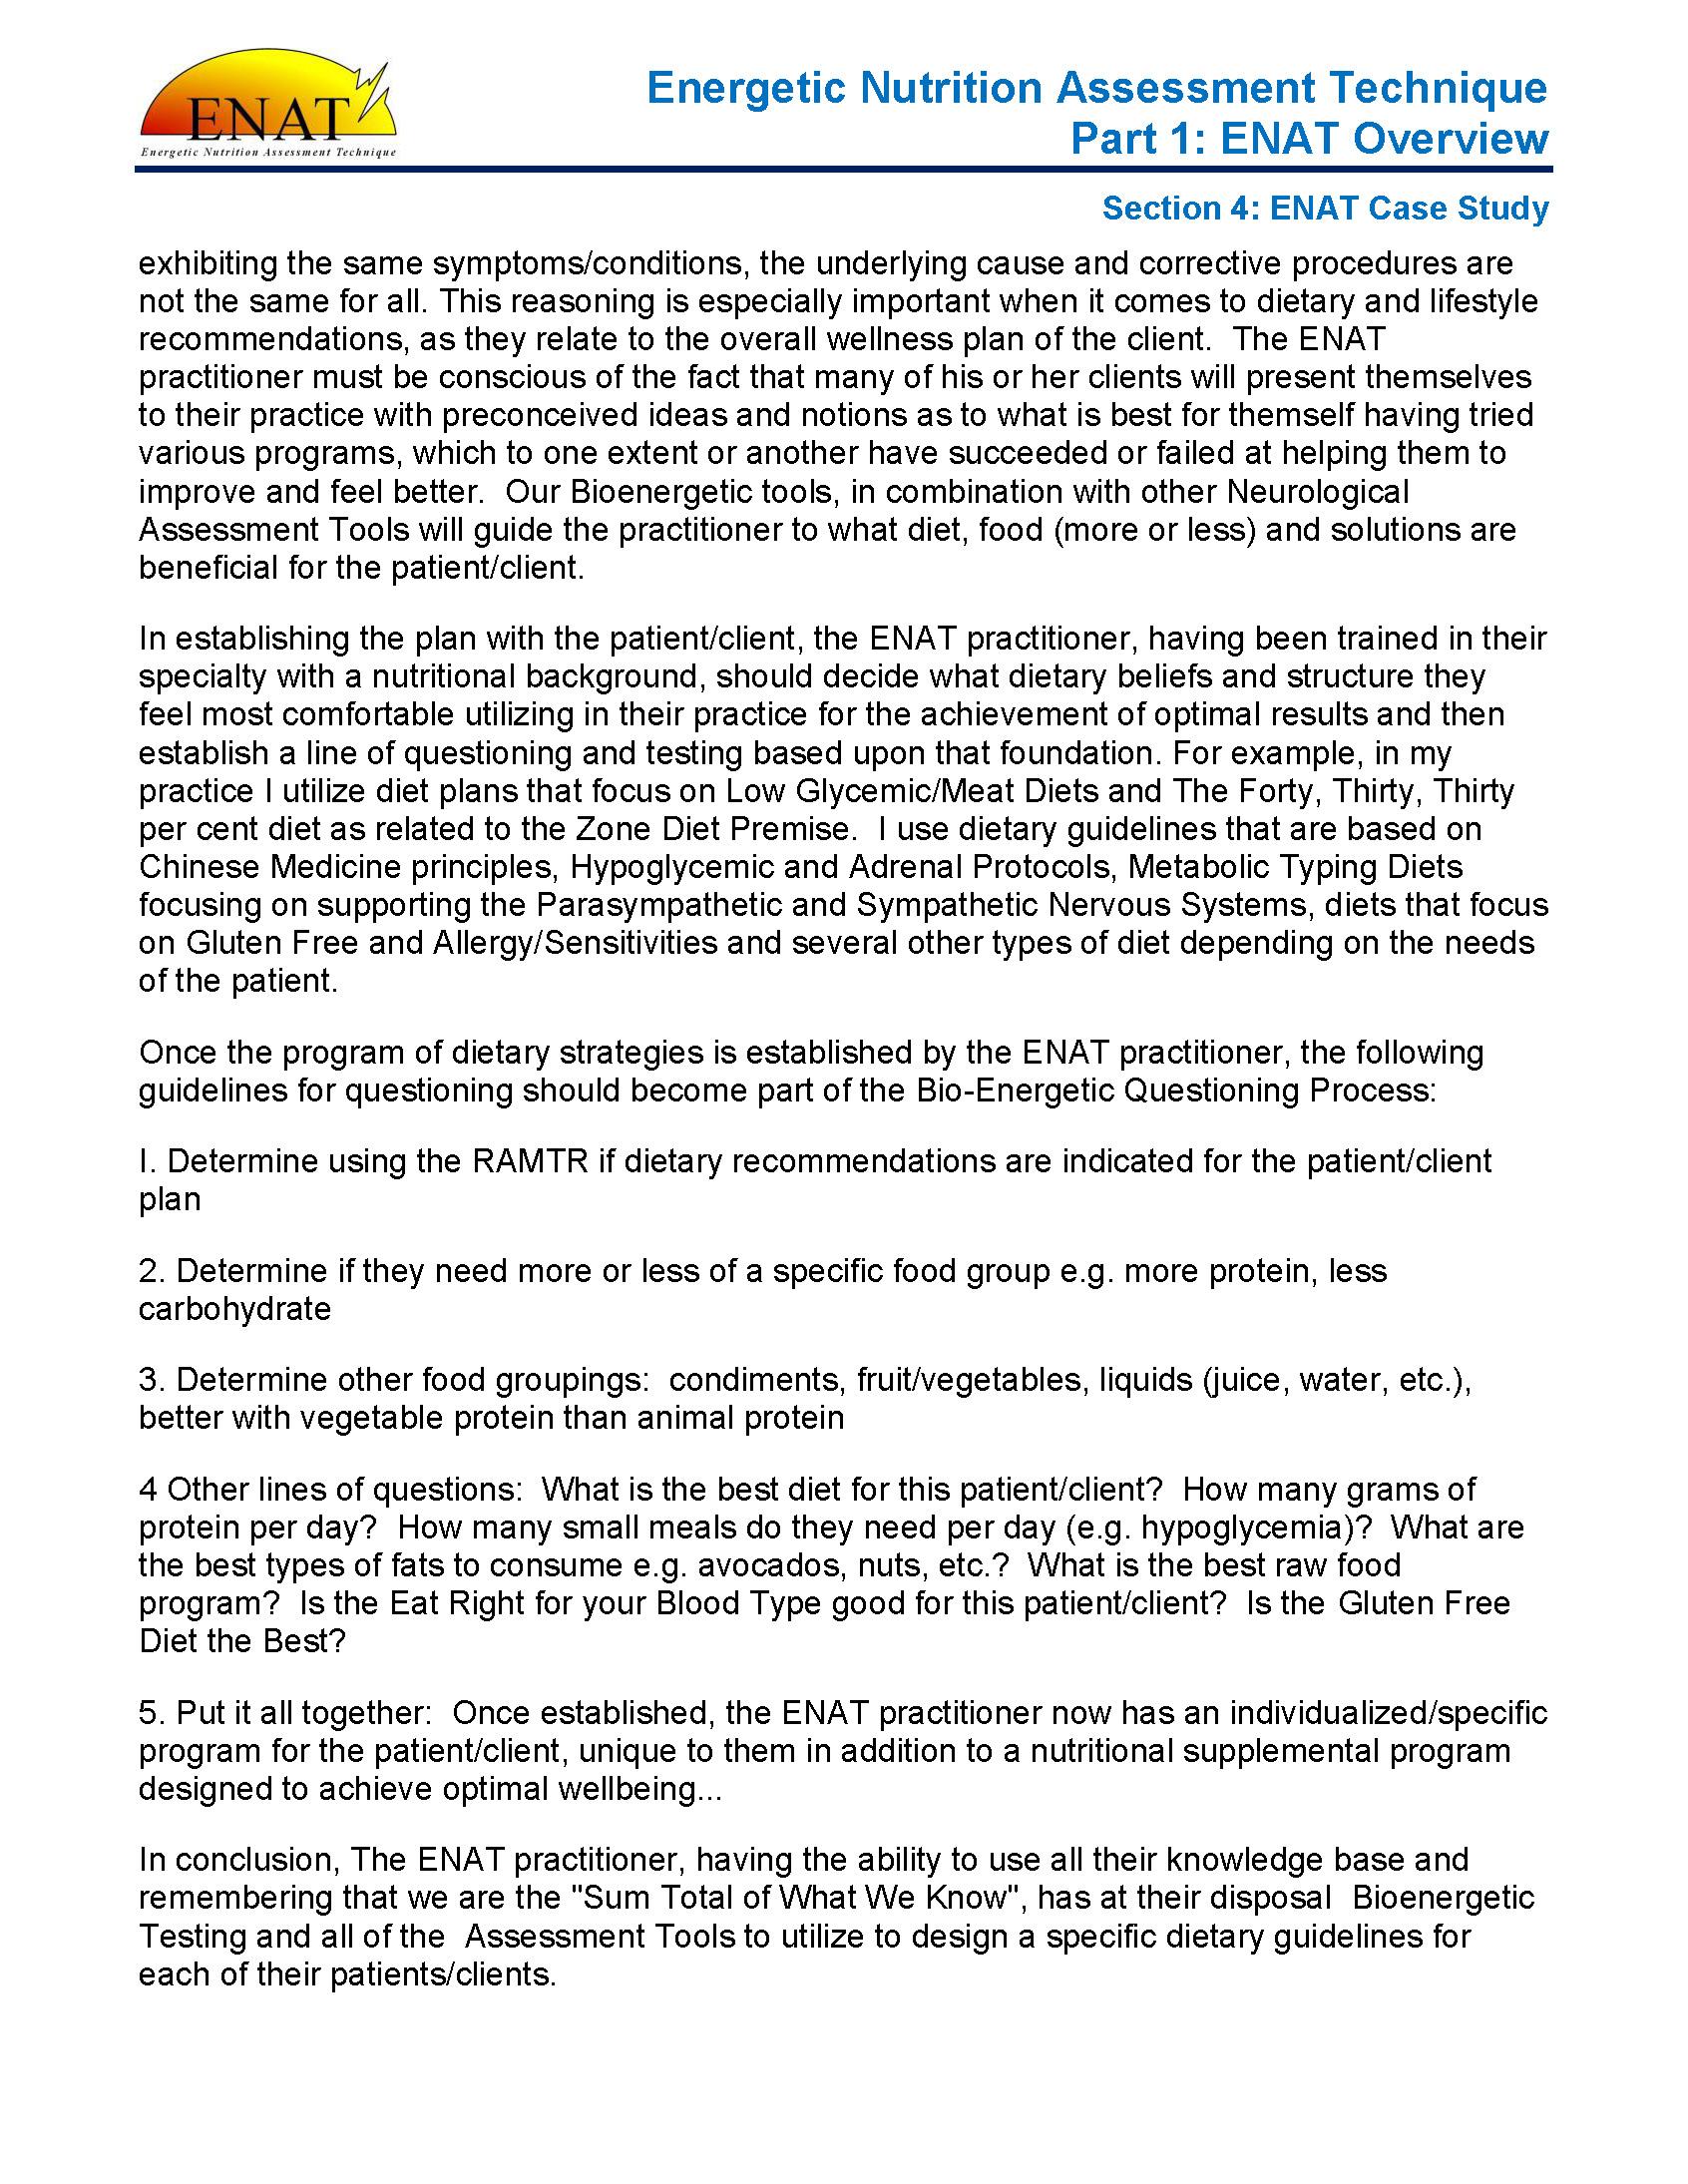 ENAT Case Study 2018_Page_6